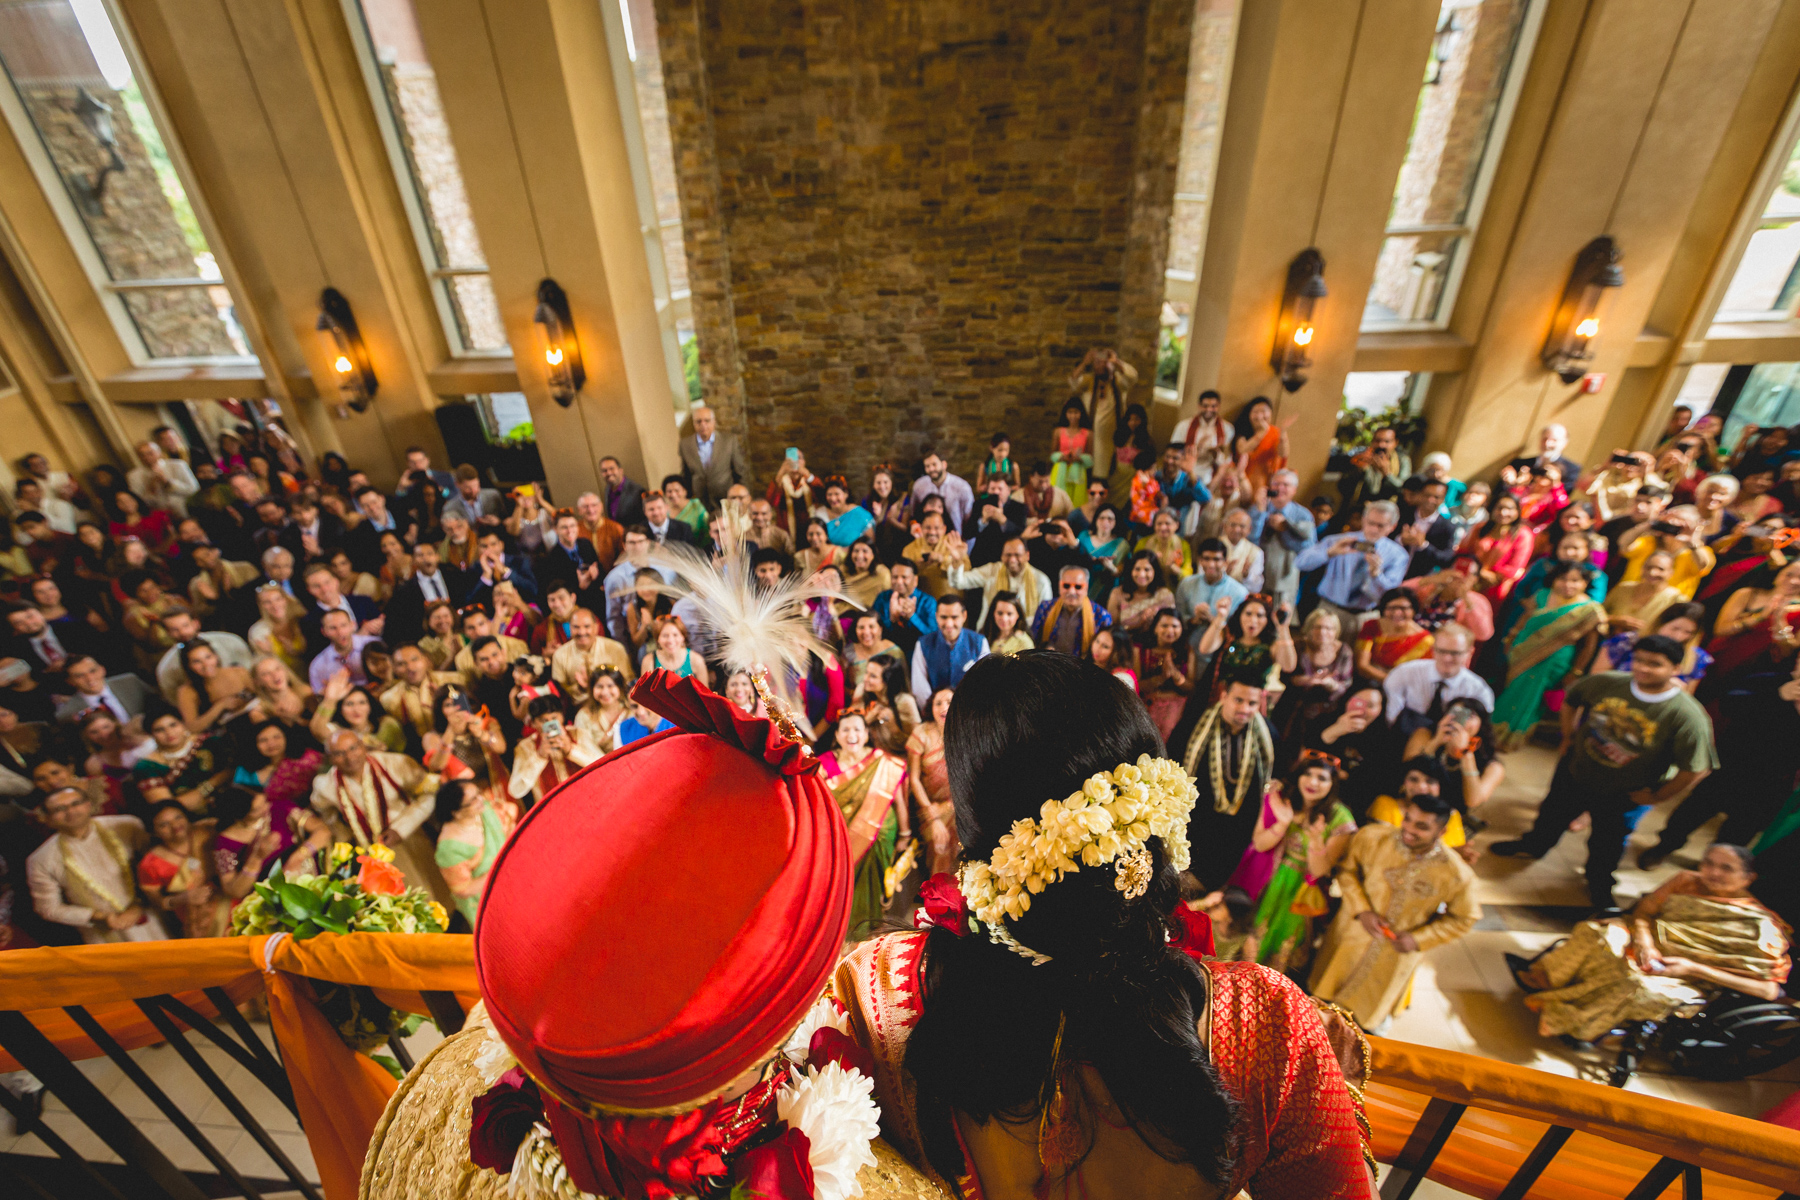 austin-indian-wedding-7.jpg